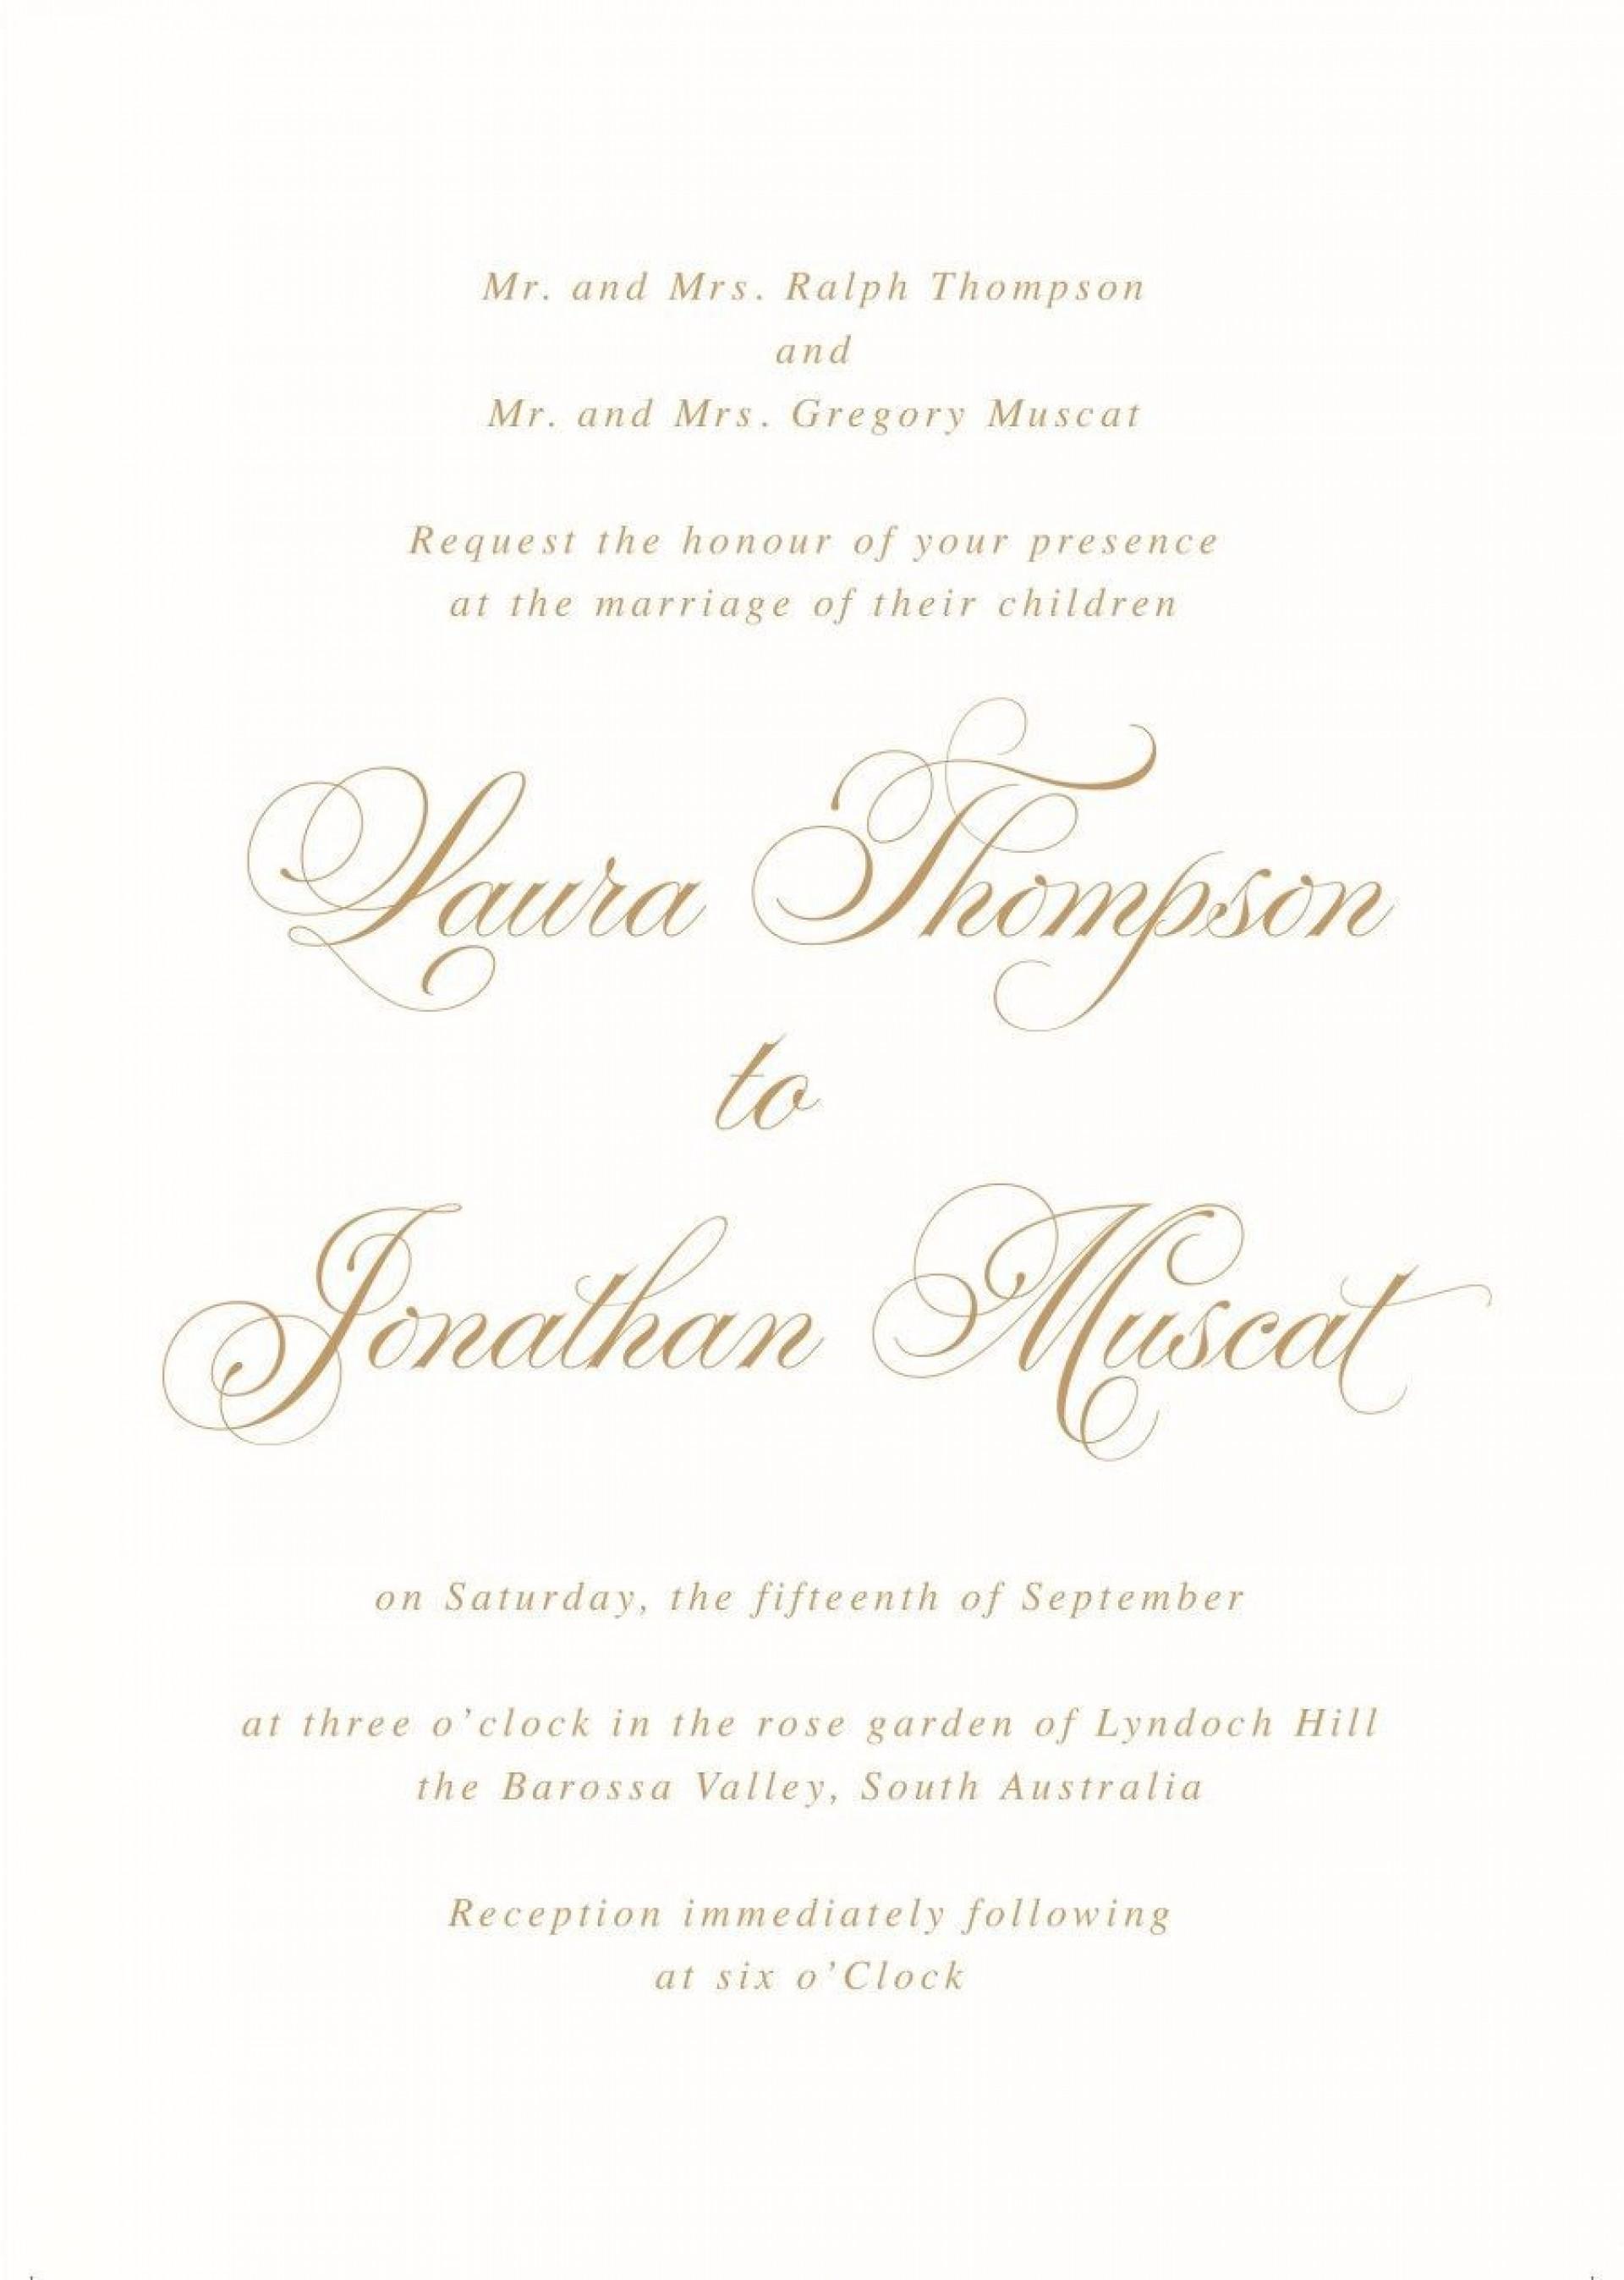 001 Fantastic Formal Wedding Invitation Wording Template Picture  Templates1920